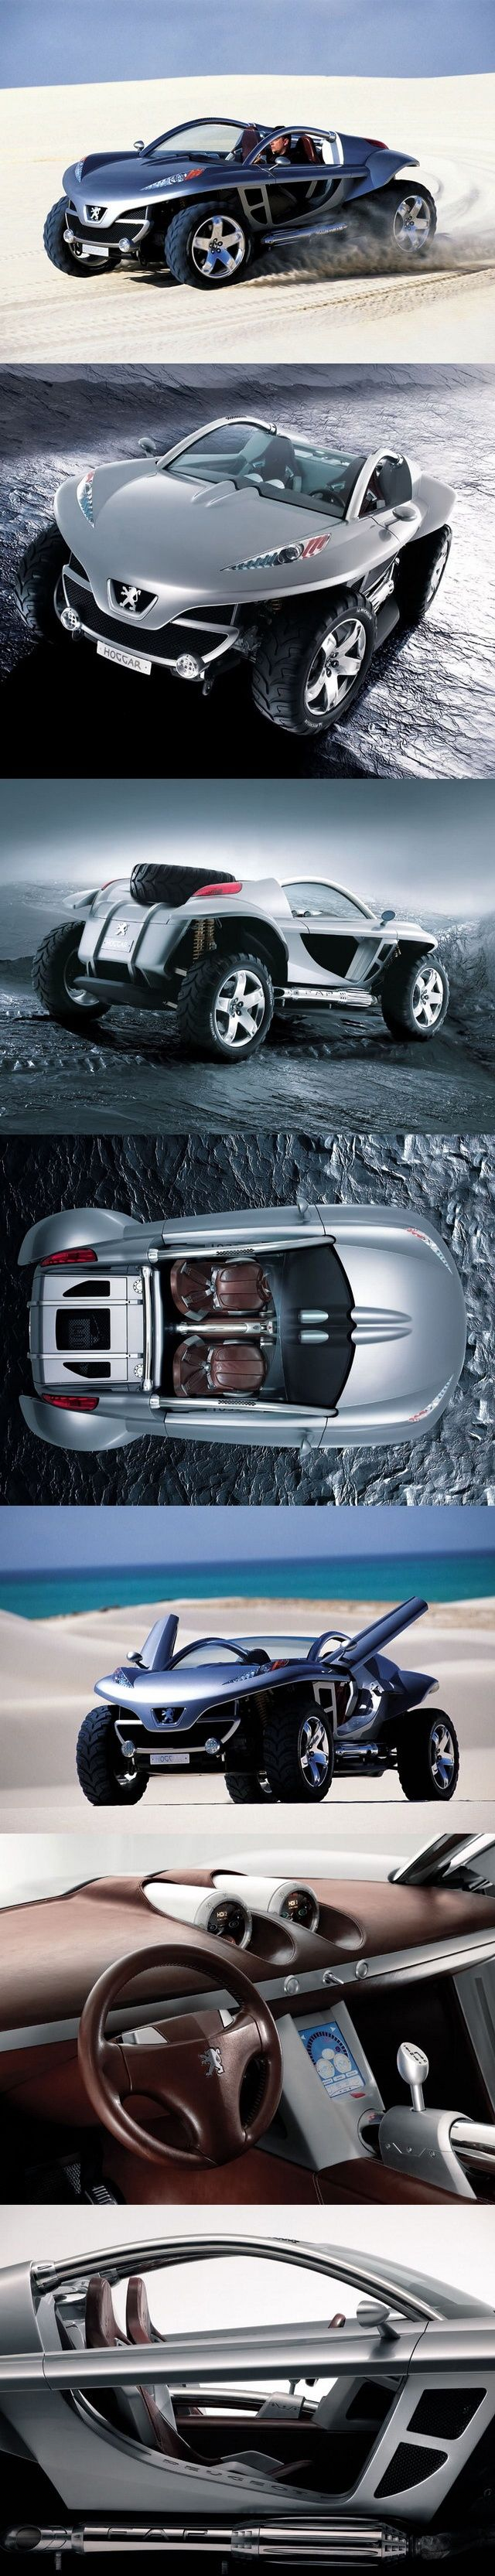 ♂ Peugeot Hoggar Silver Concept Car